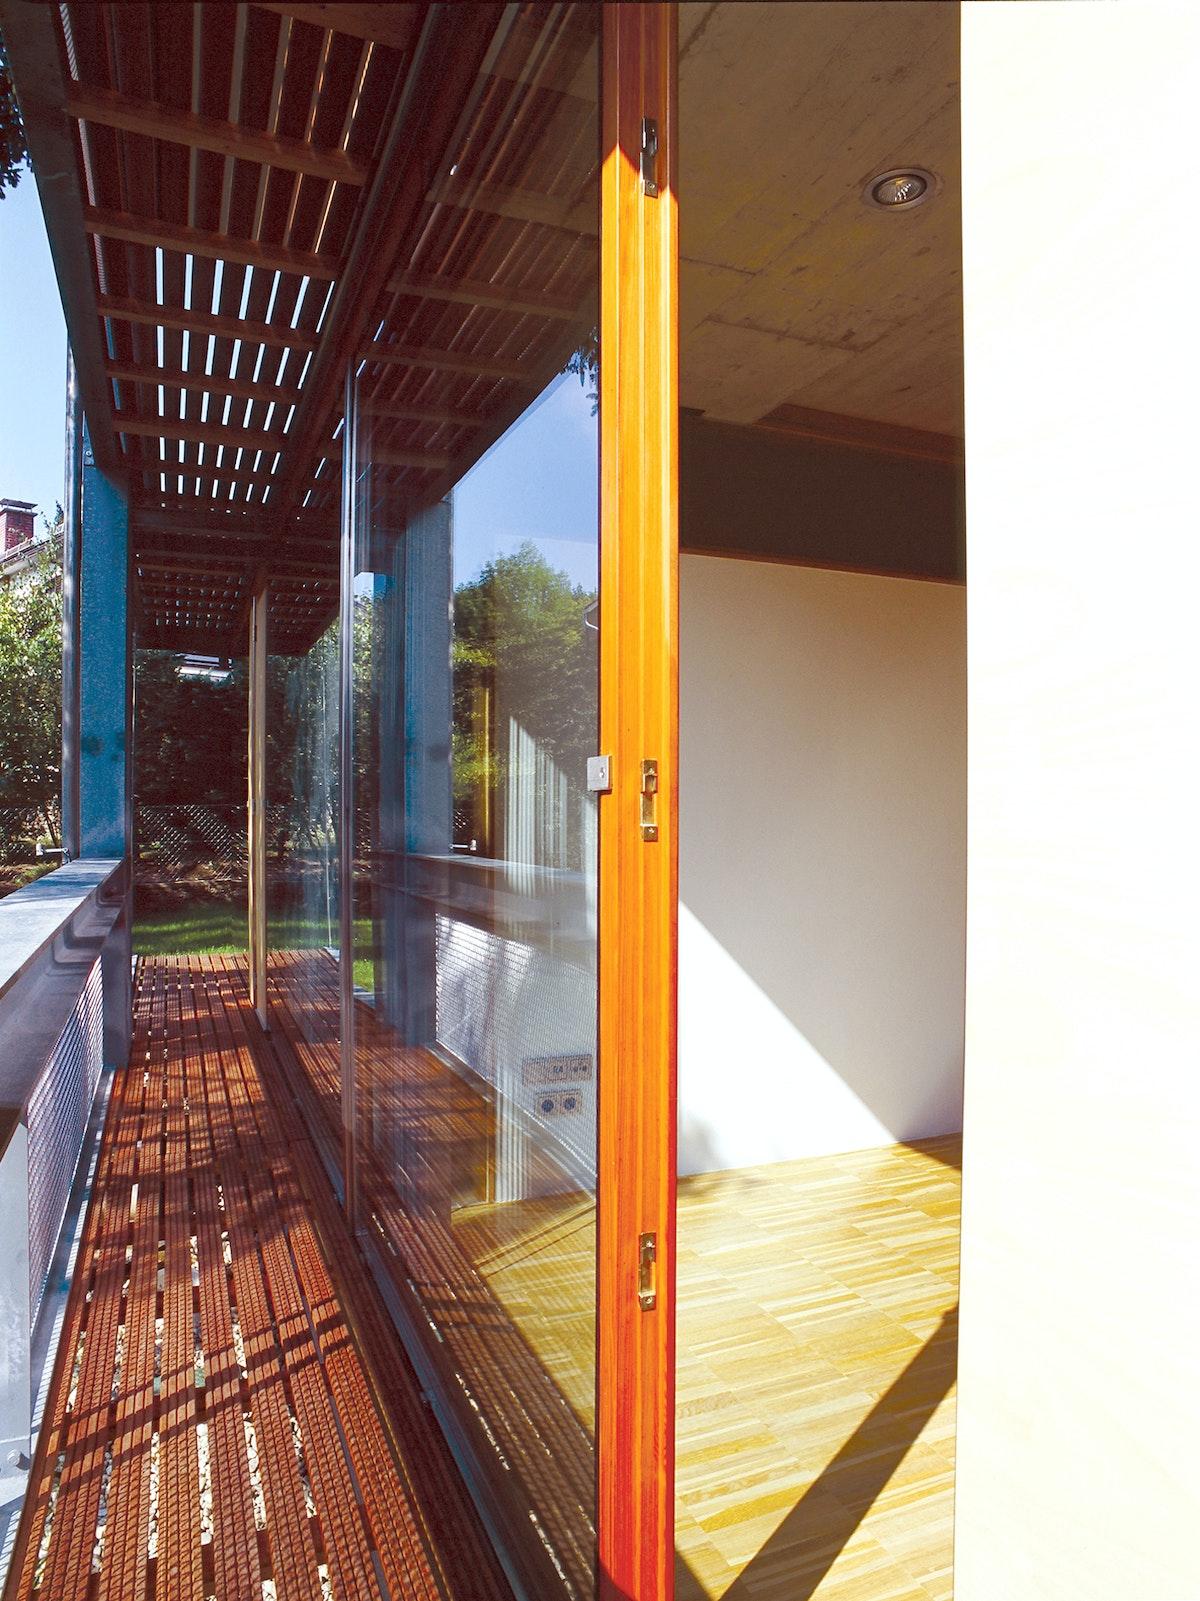 Solar Deck Lew Rodin 79020025